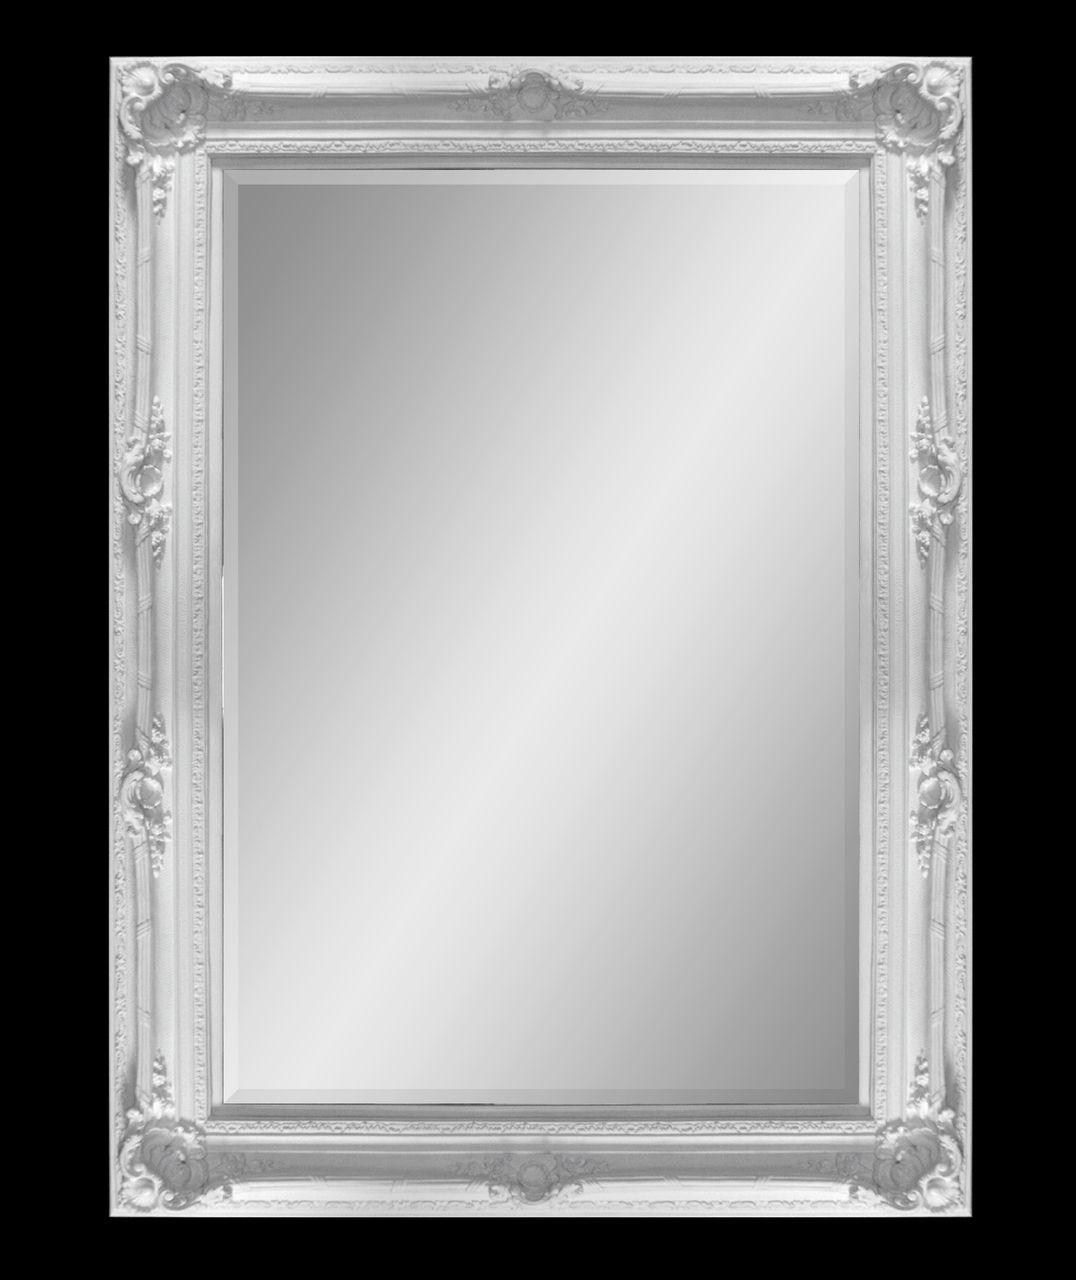 48 x 72 mirror framed mirror renaissance mirror 48x72 white finish world of decor city island pinterest